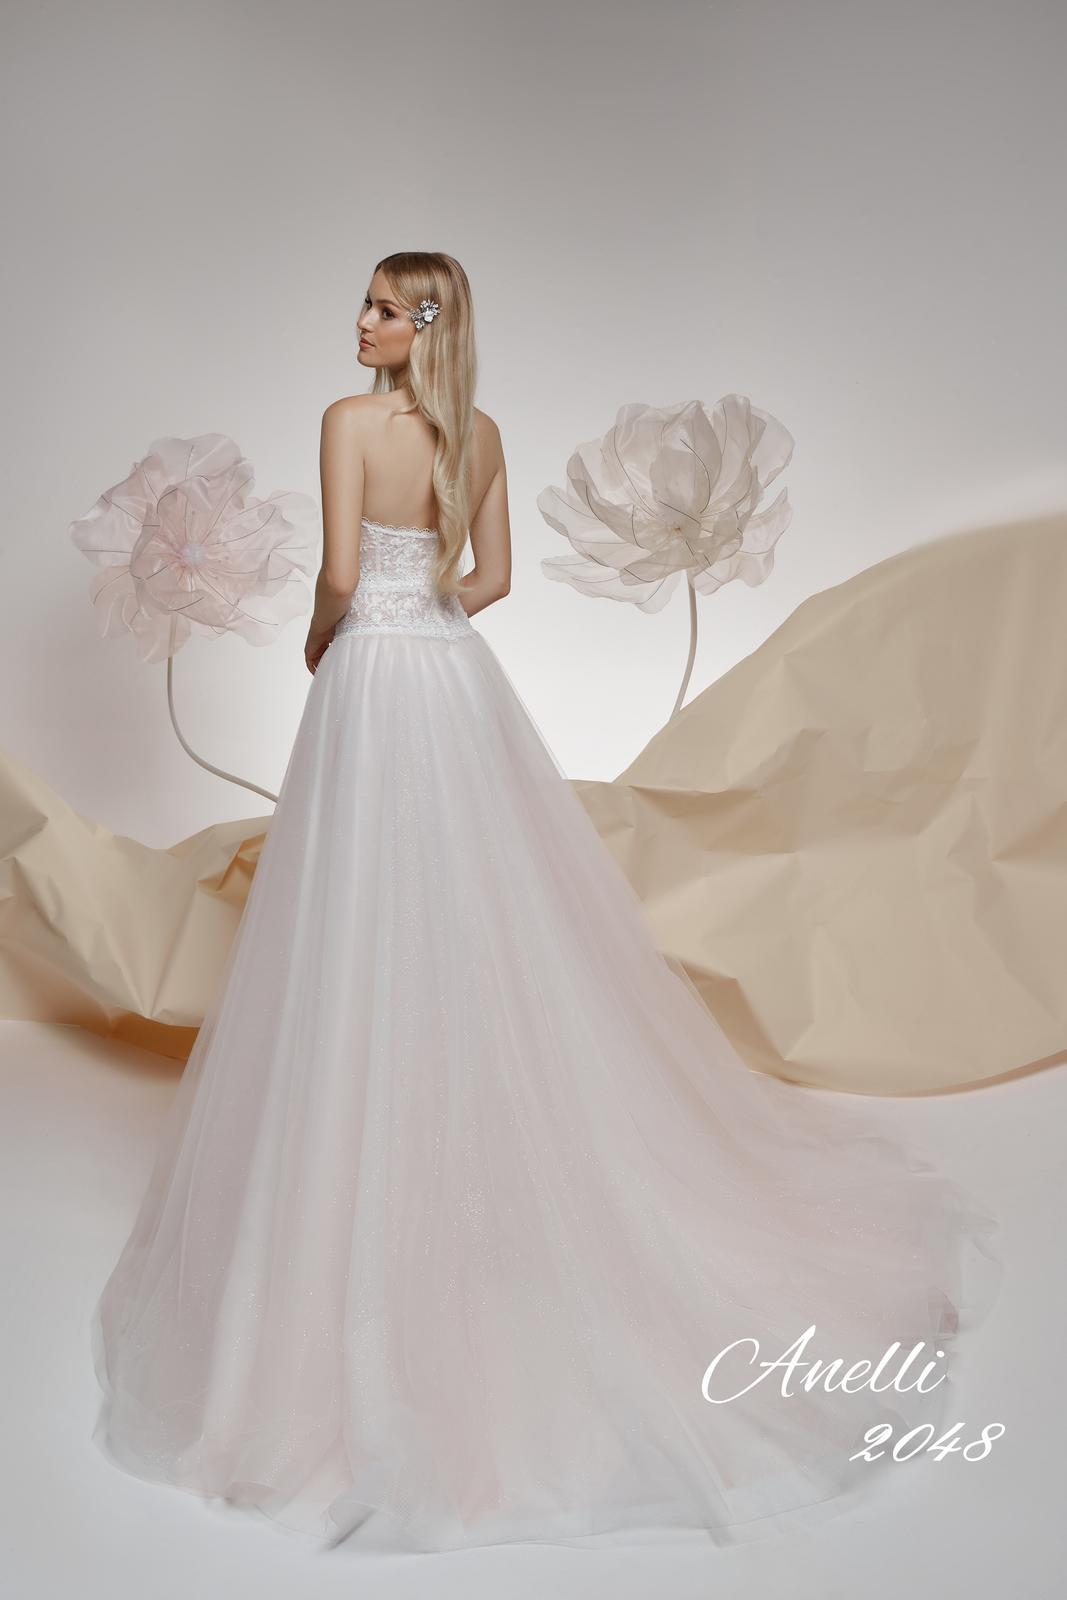 Svadobné šaty - Imagine 2048 - Obrázok č. 3